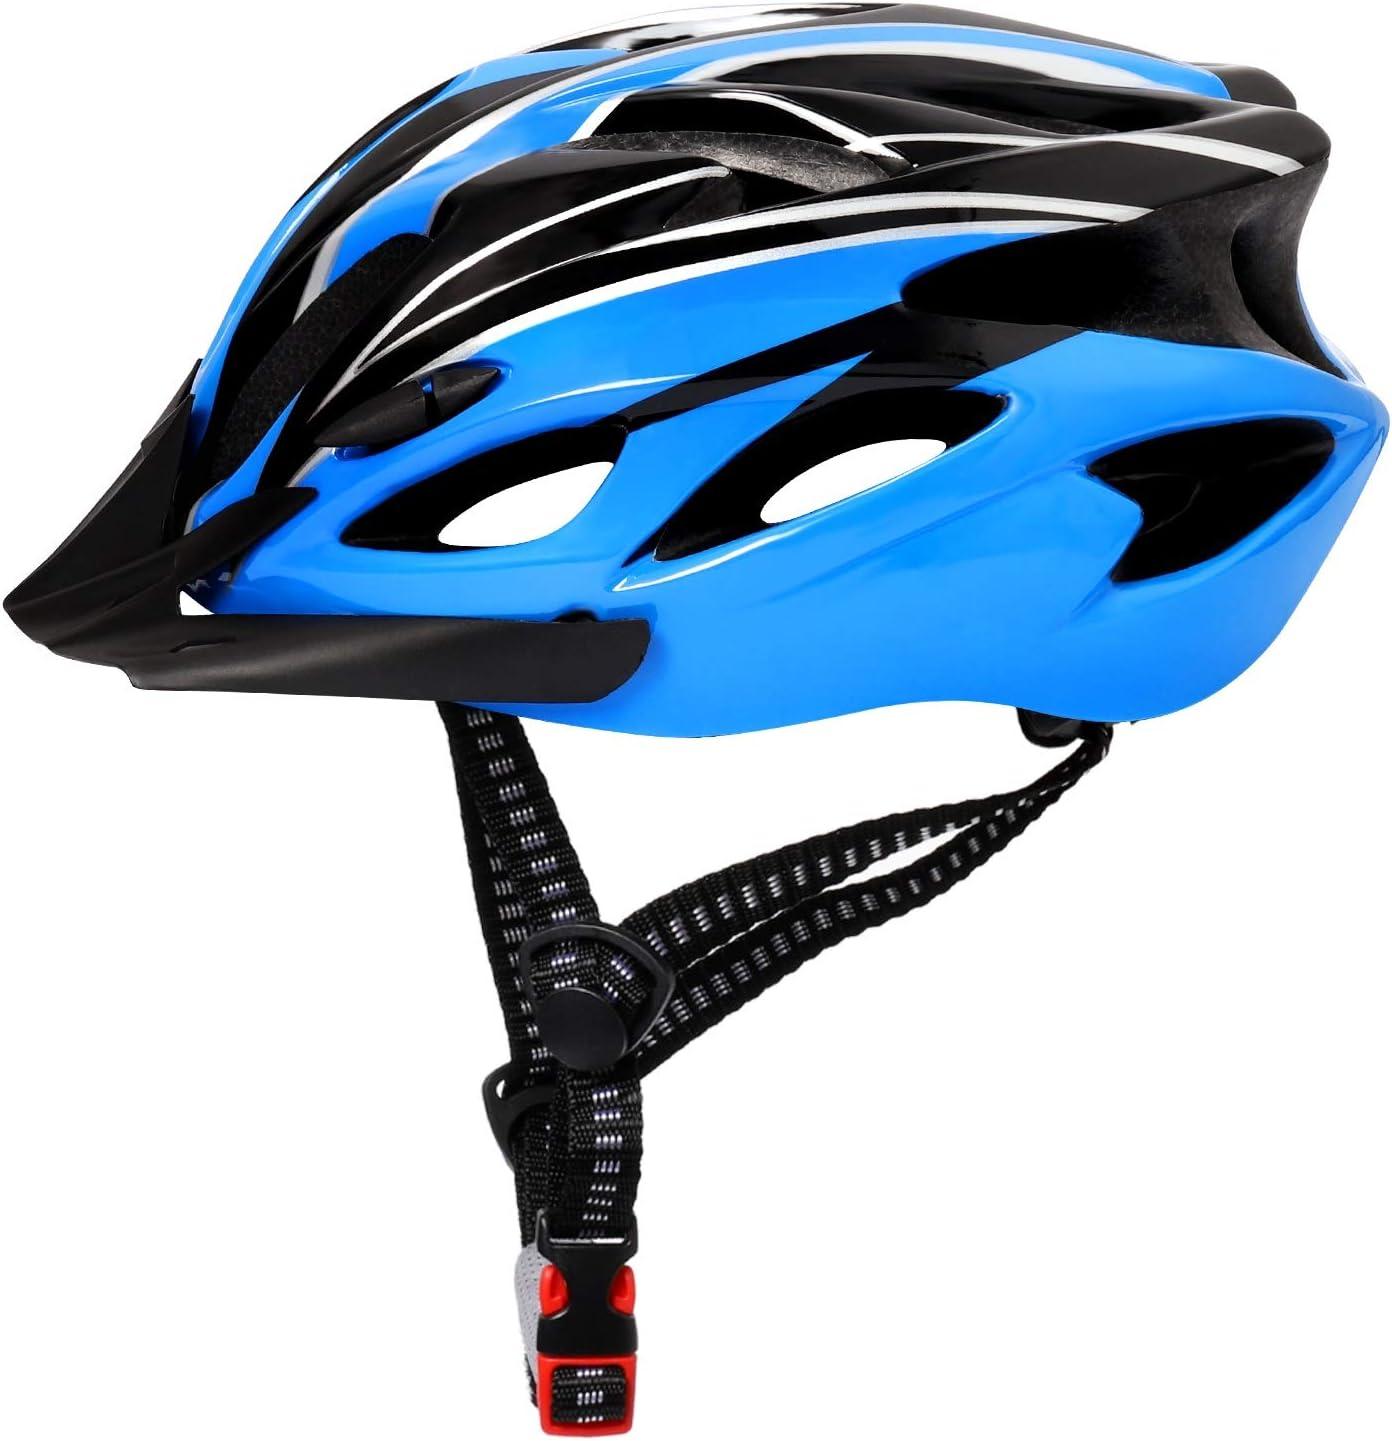 Adult Super sale period limited Bike Helmet Adjustable 57-62cm with Vents Visor an 18 Sun shopping